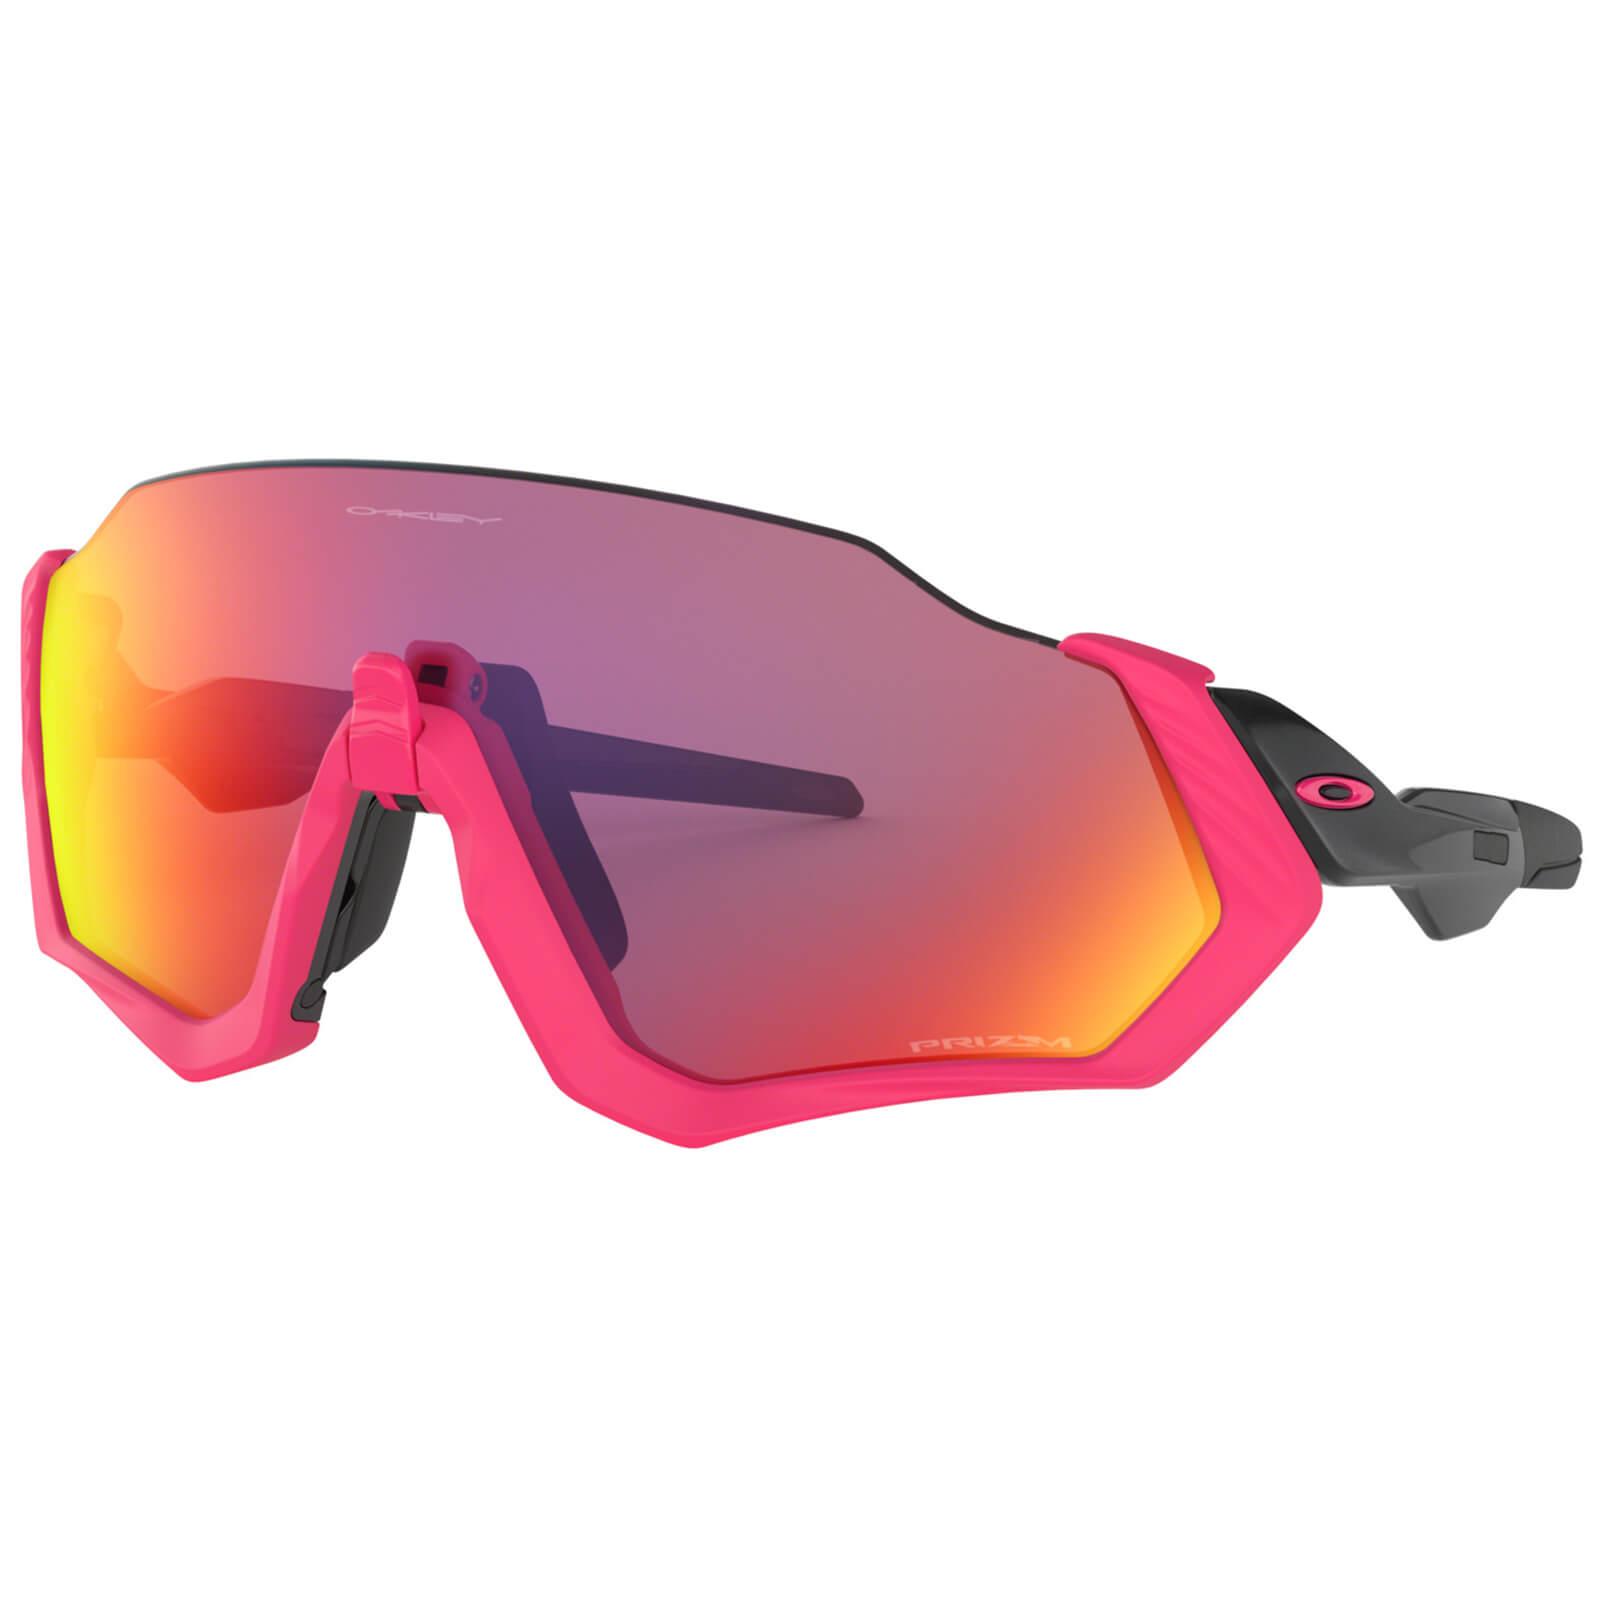 Oakley Flight Jacket Sunglasses - Neon Pink/Prizm Road